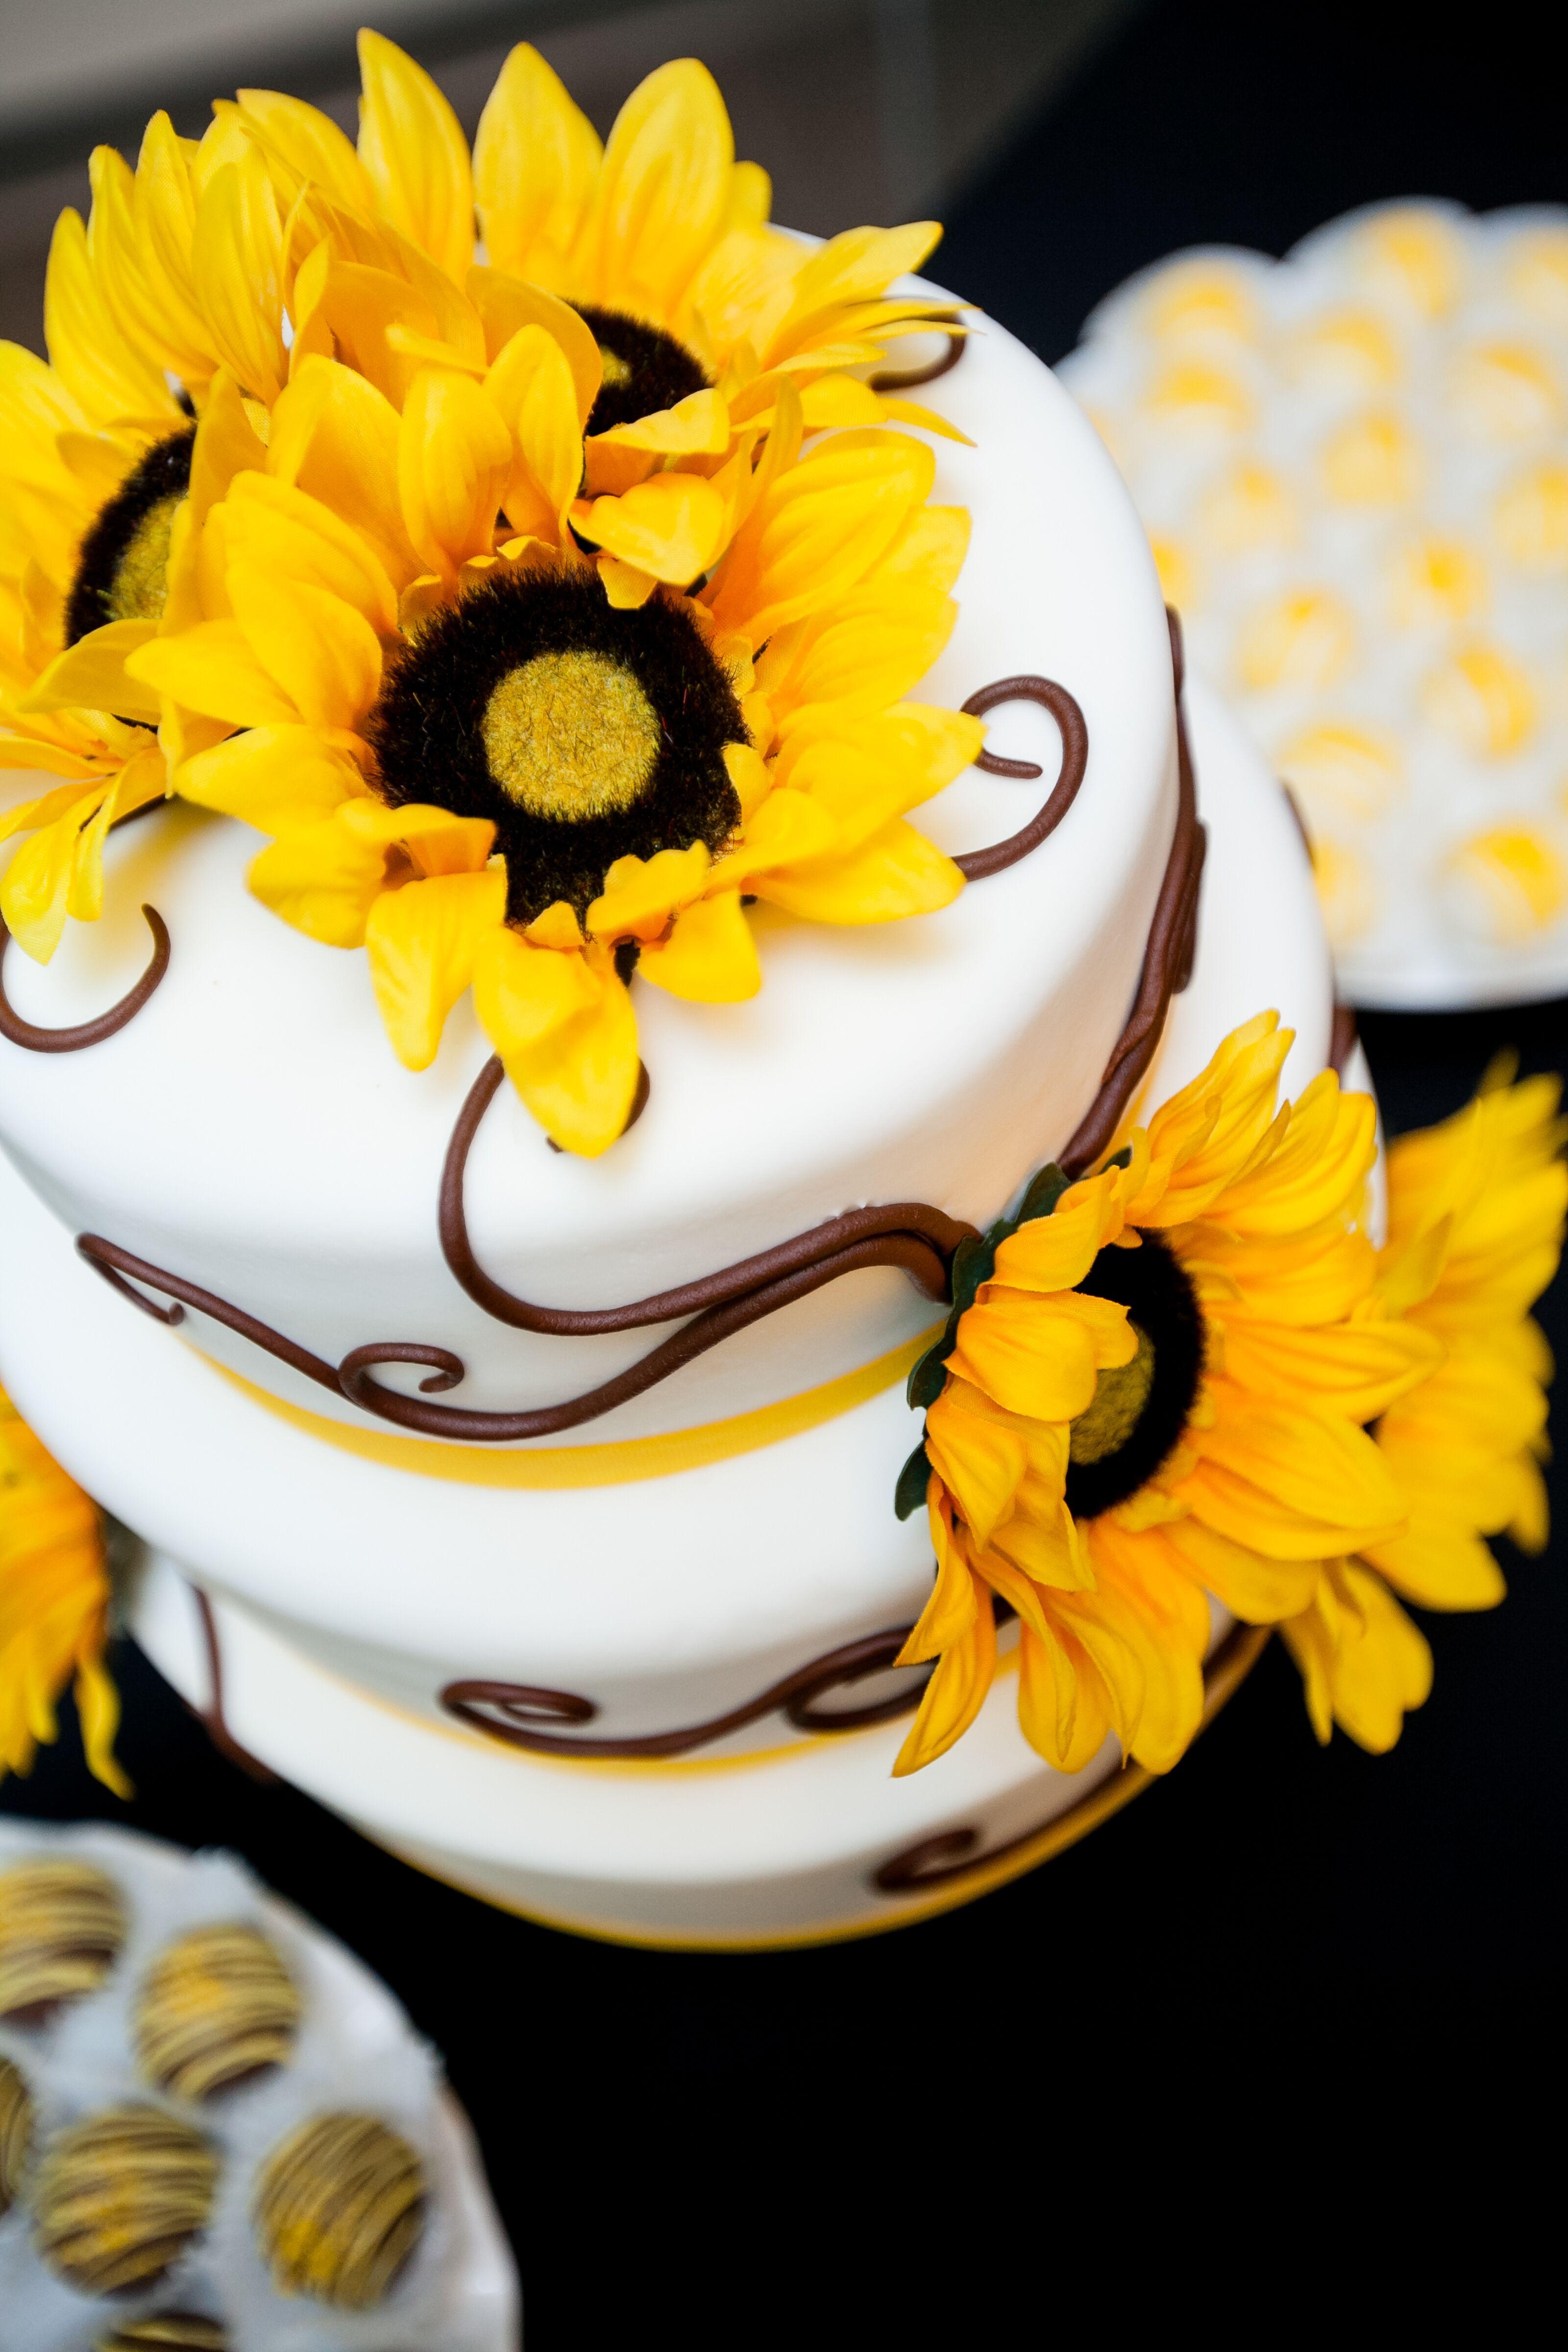 White Wedding Cake With Sunflower Decor